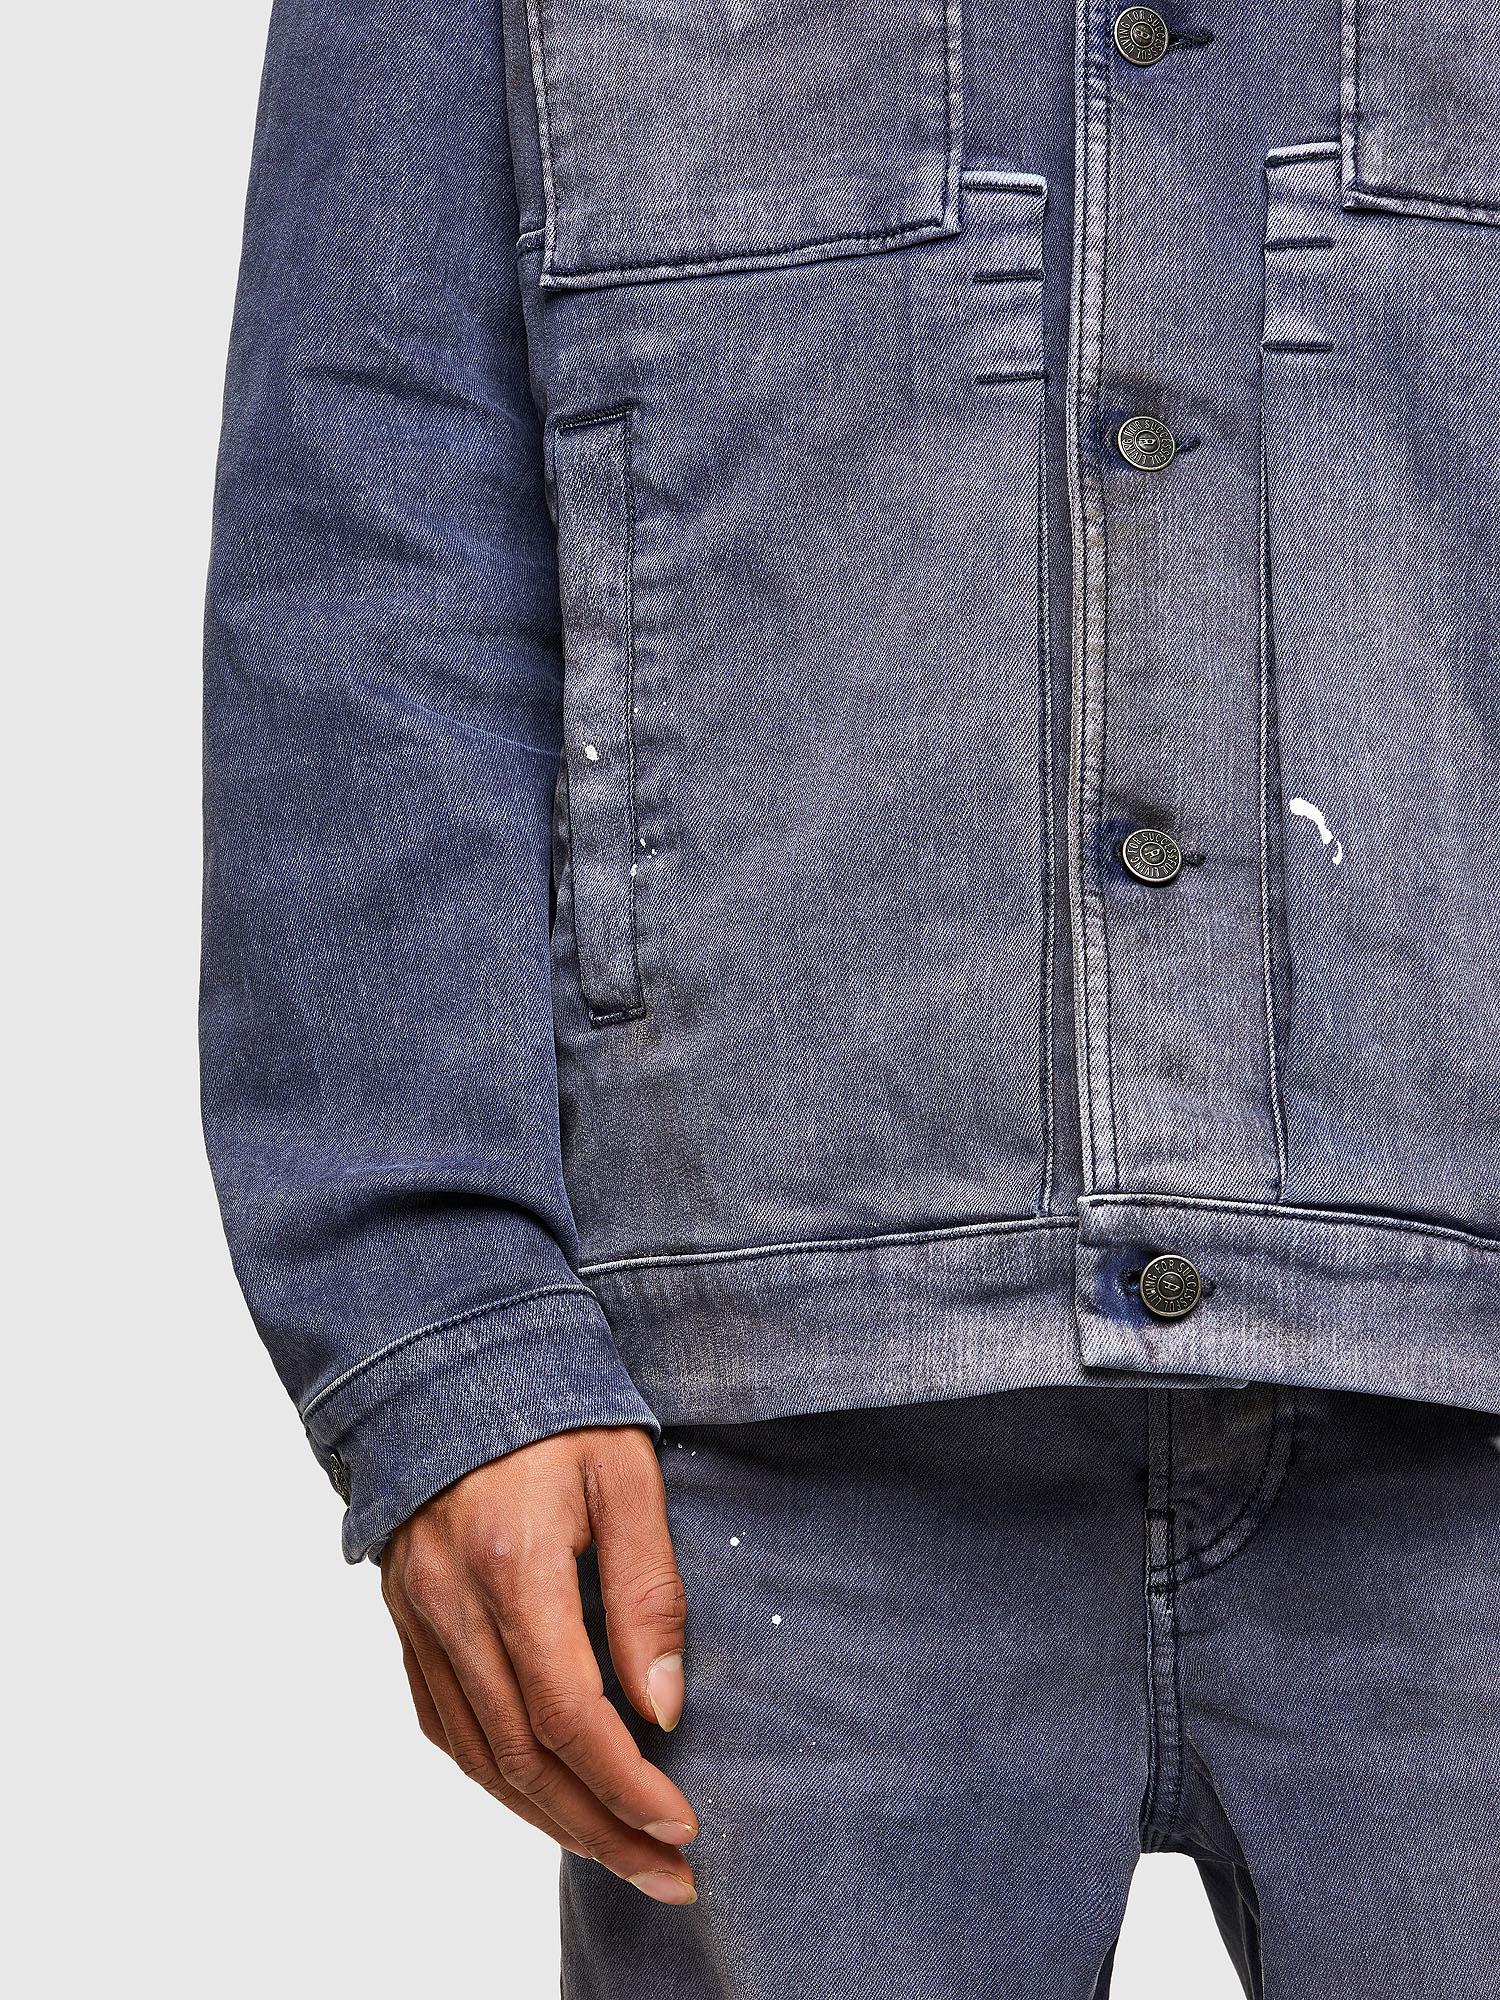 Diesel - D-ANTONY-SP, Medium blue - Denim Jackets - Image 5